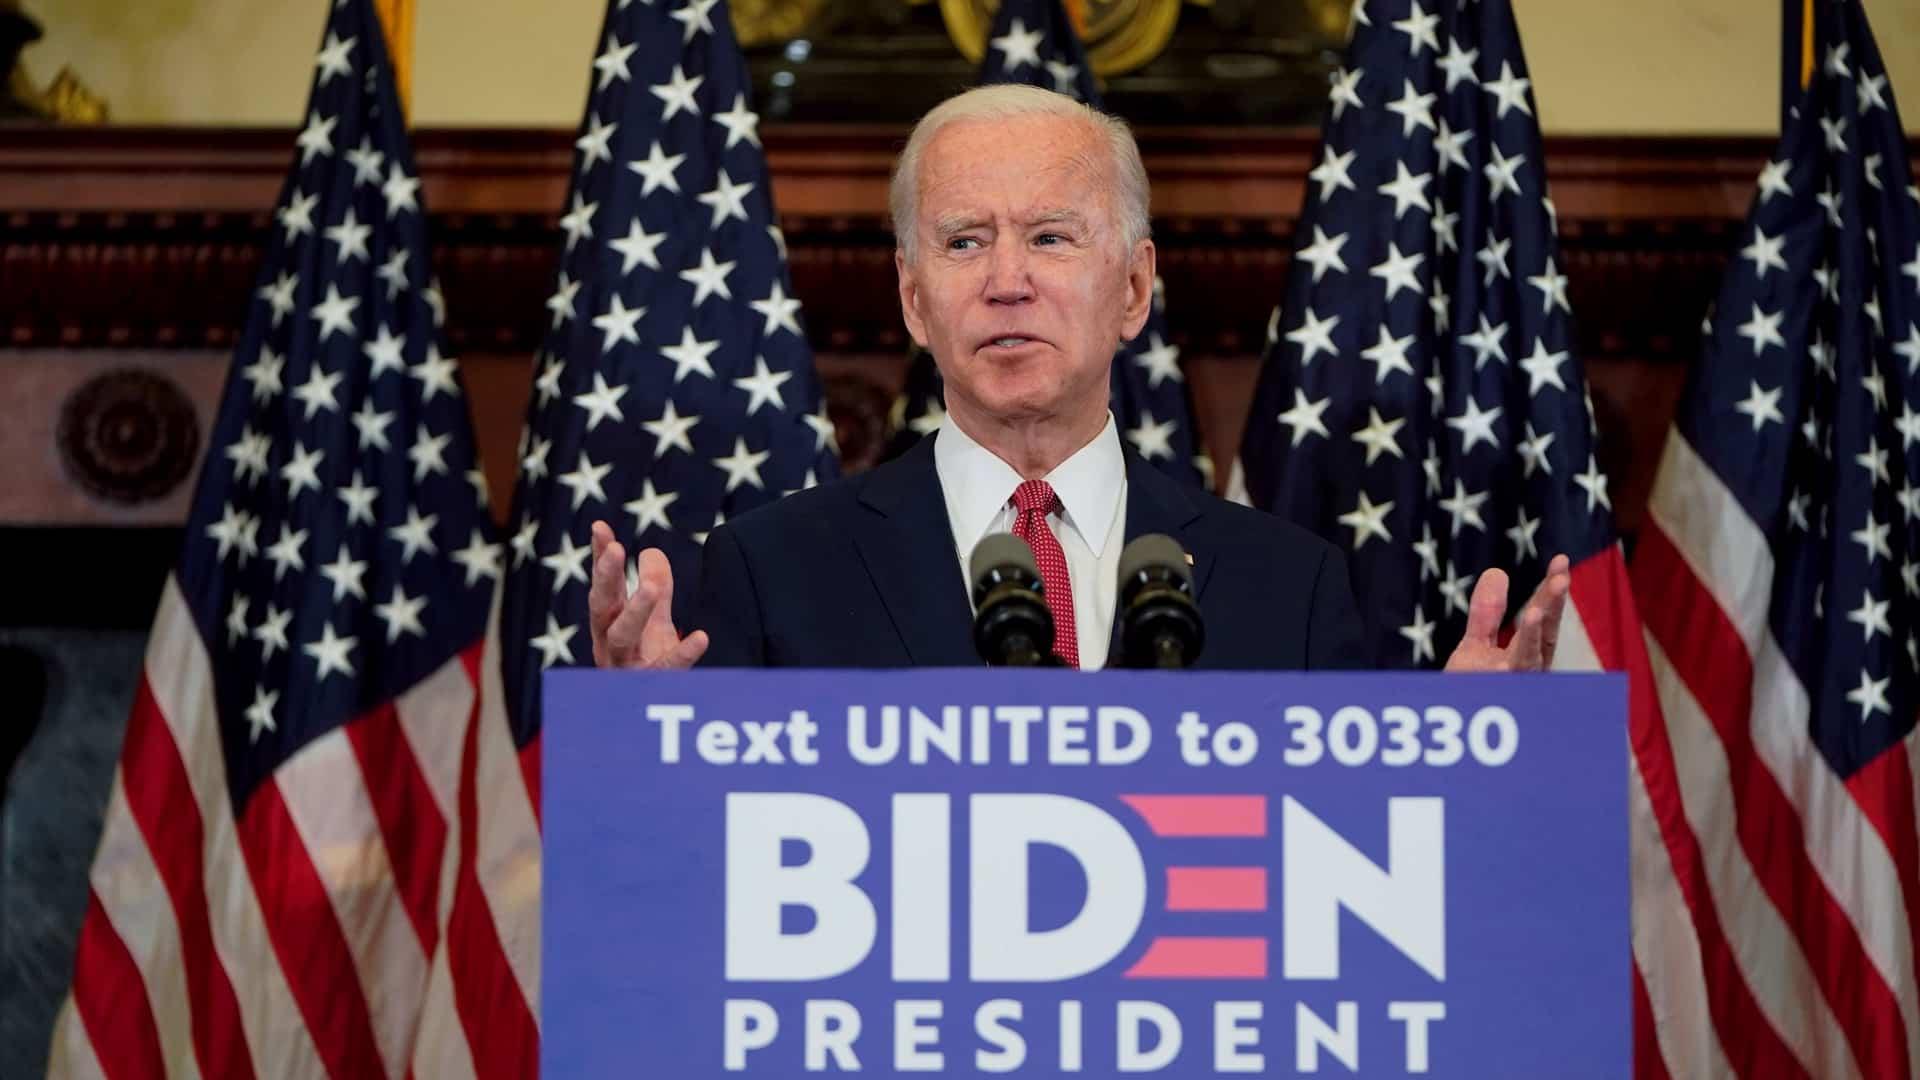 Apple, Google, other US business groups applaud Biden's immigration reforms